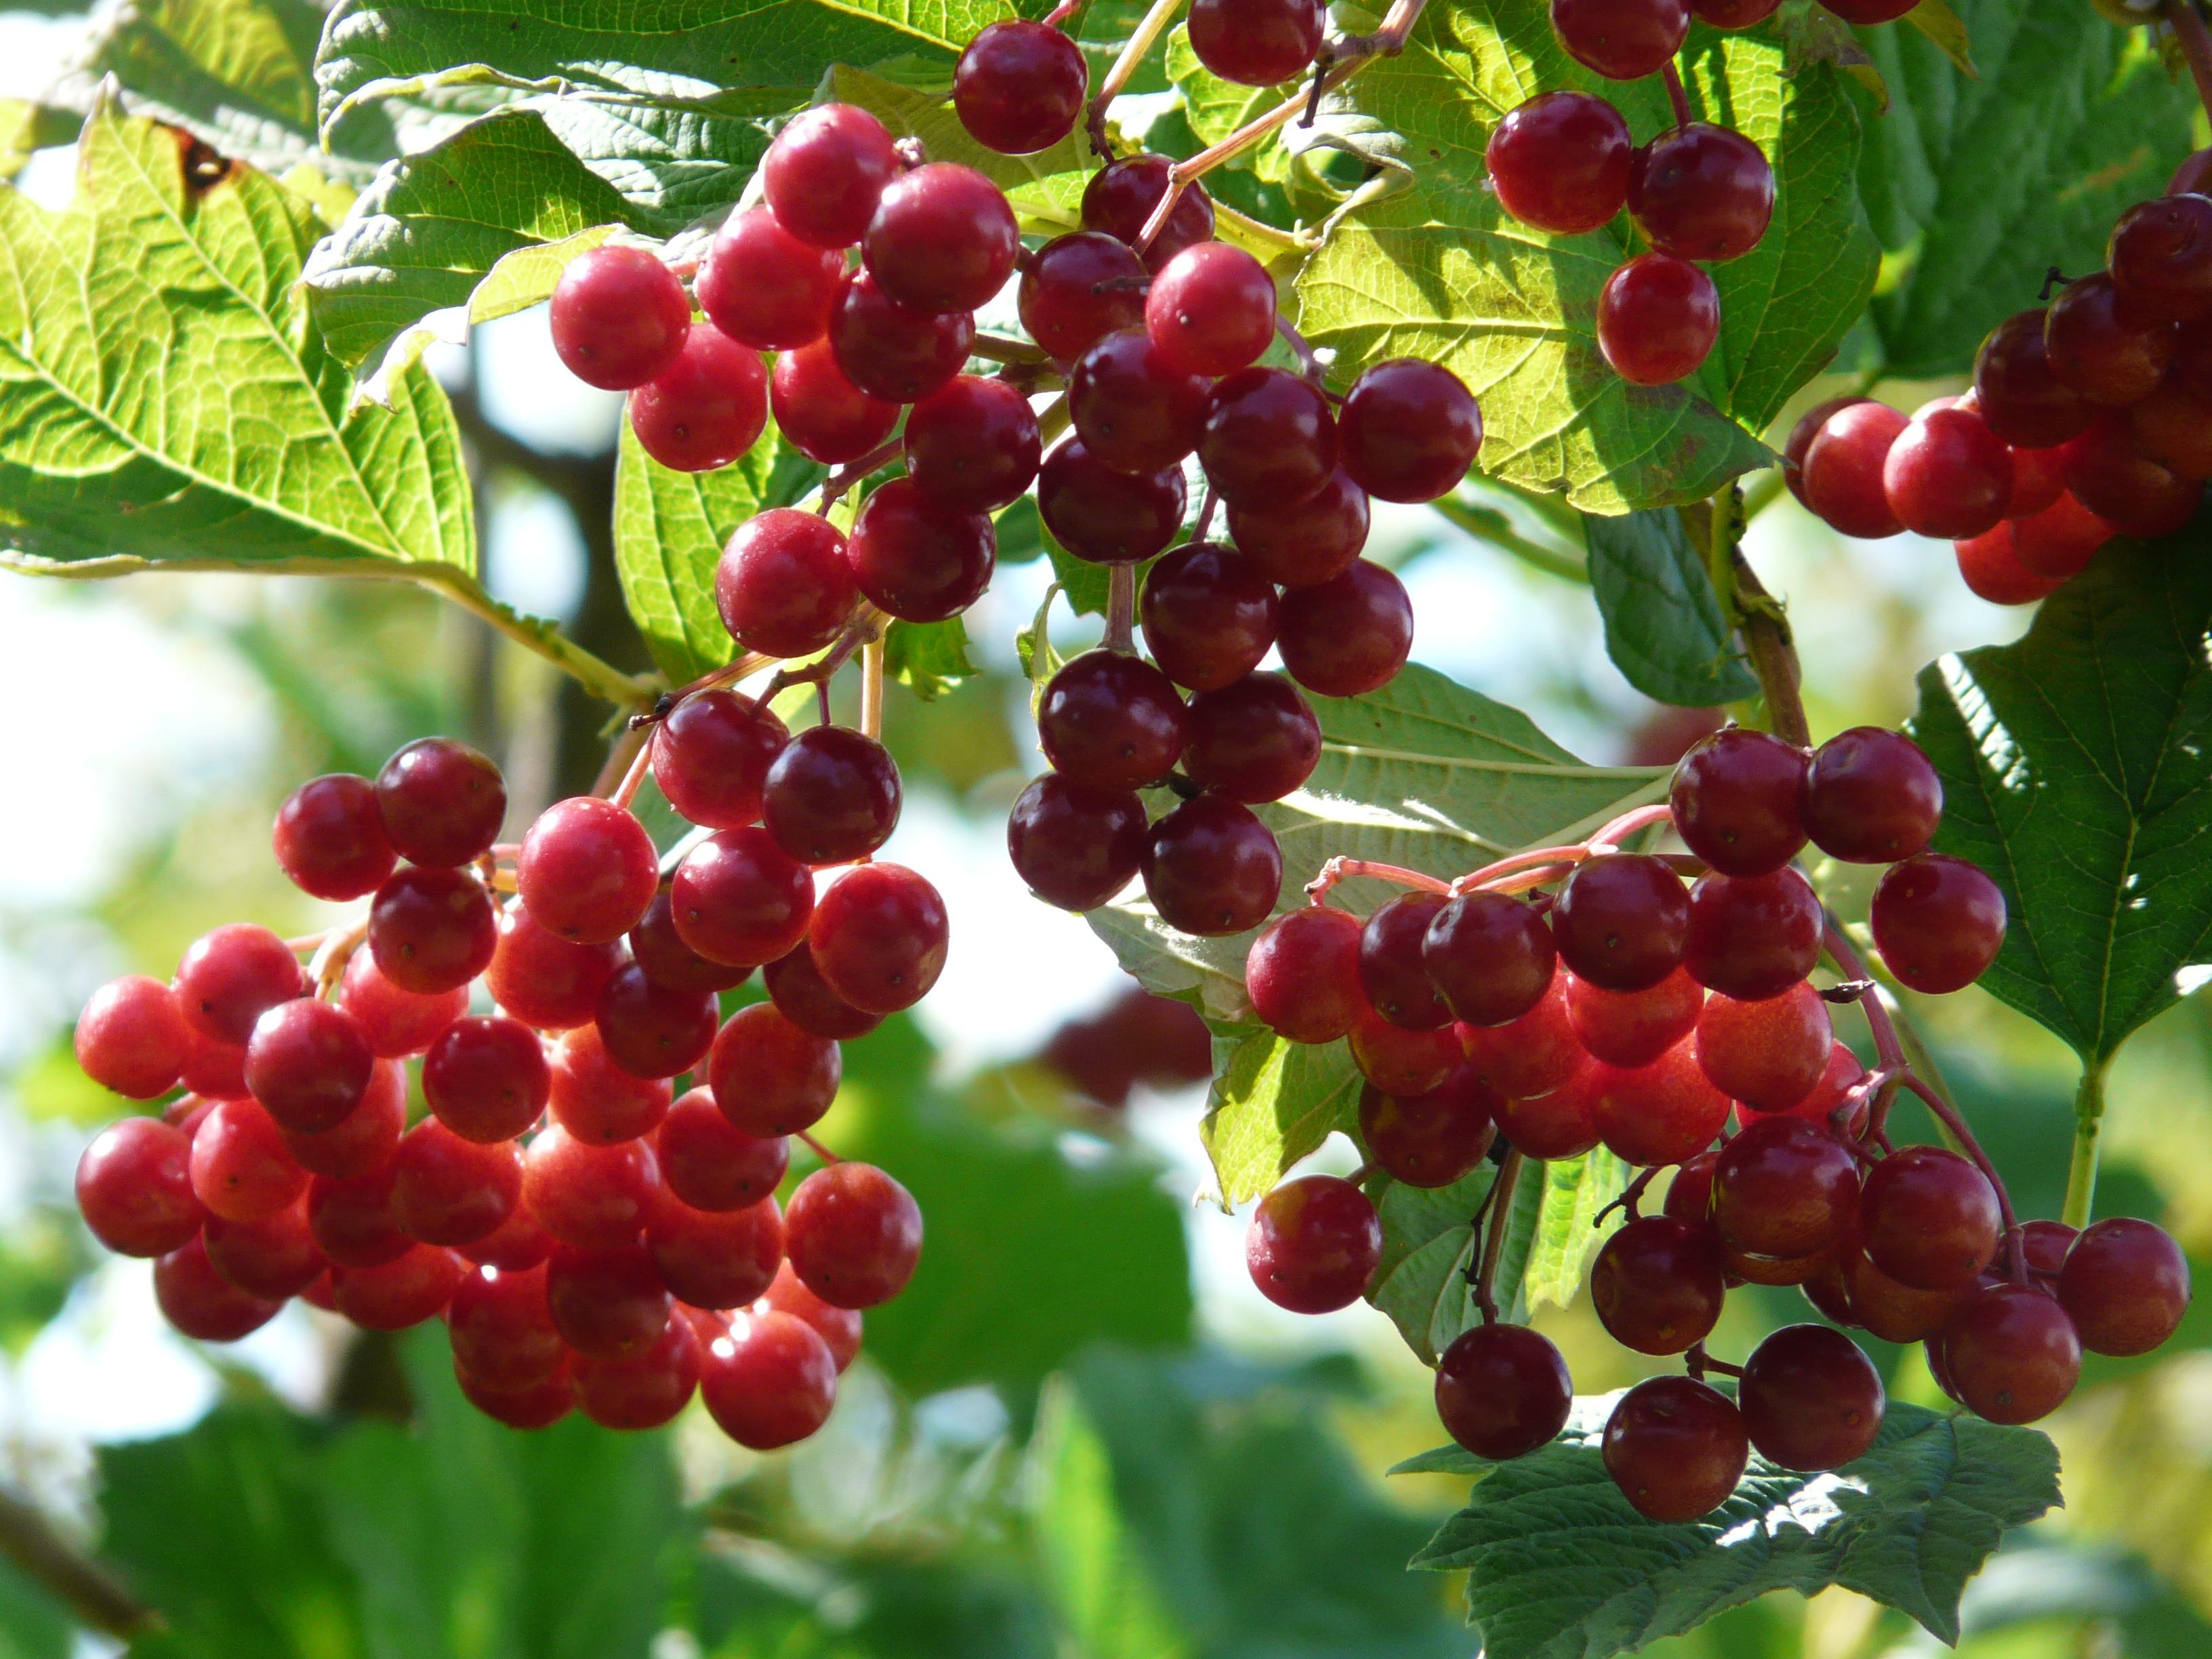 plant fruit berry flower ripe food 1144960 pxhere.com